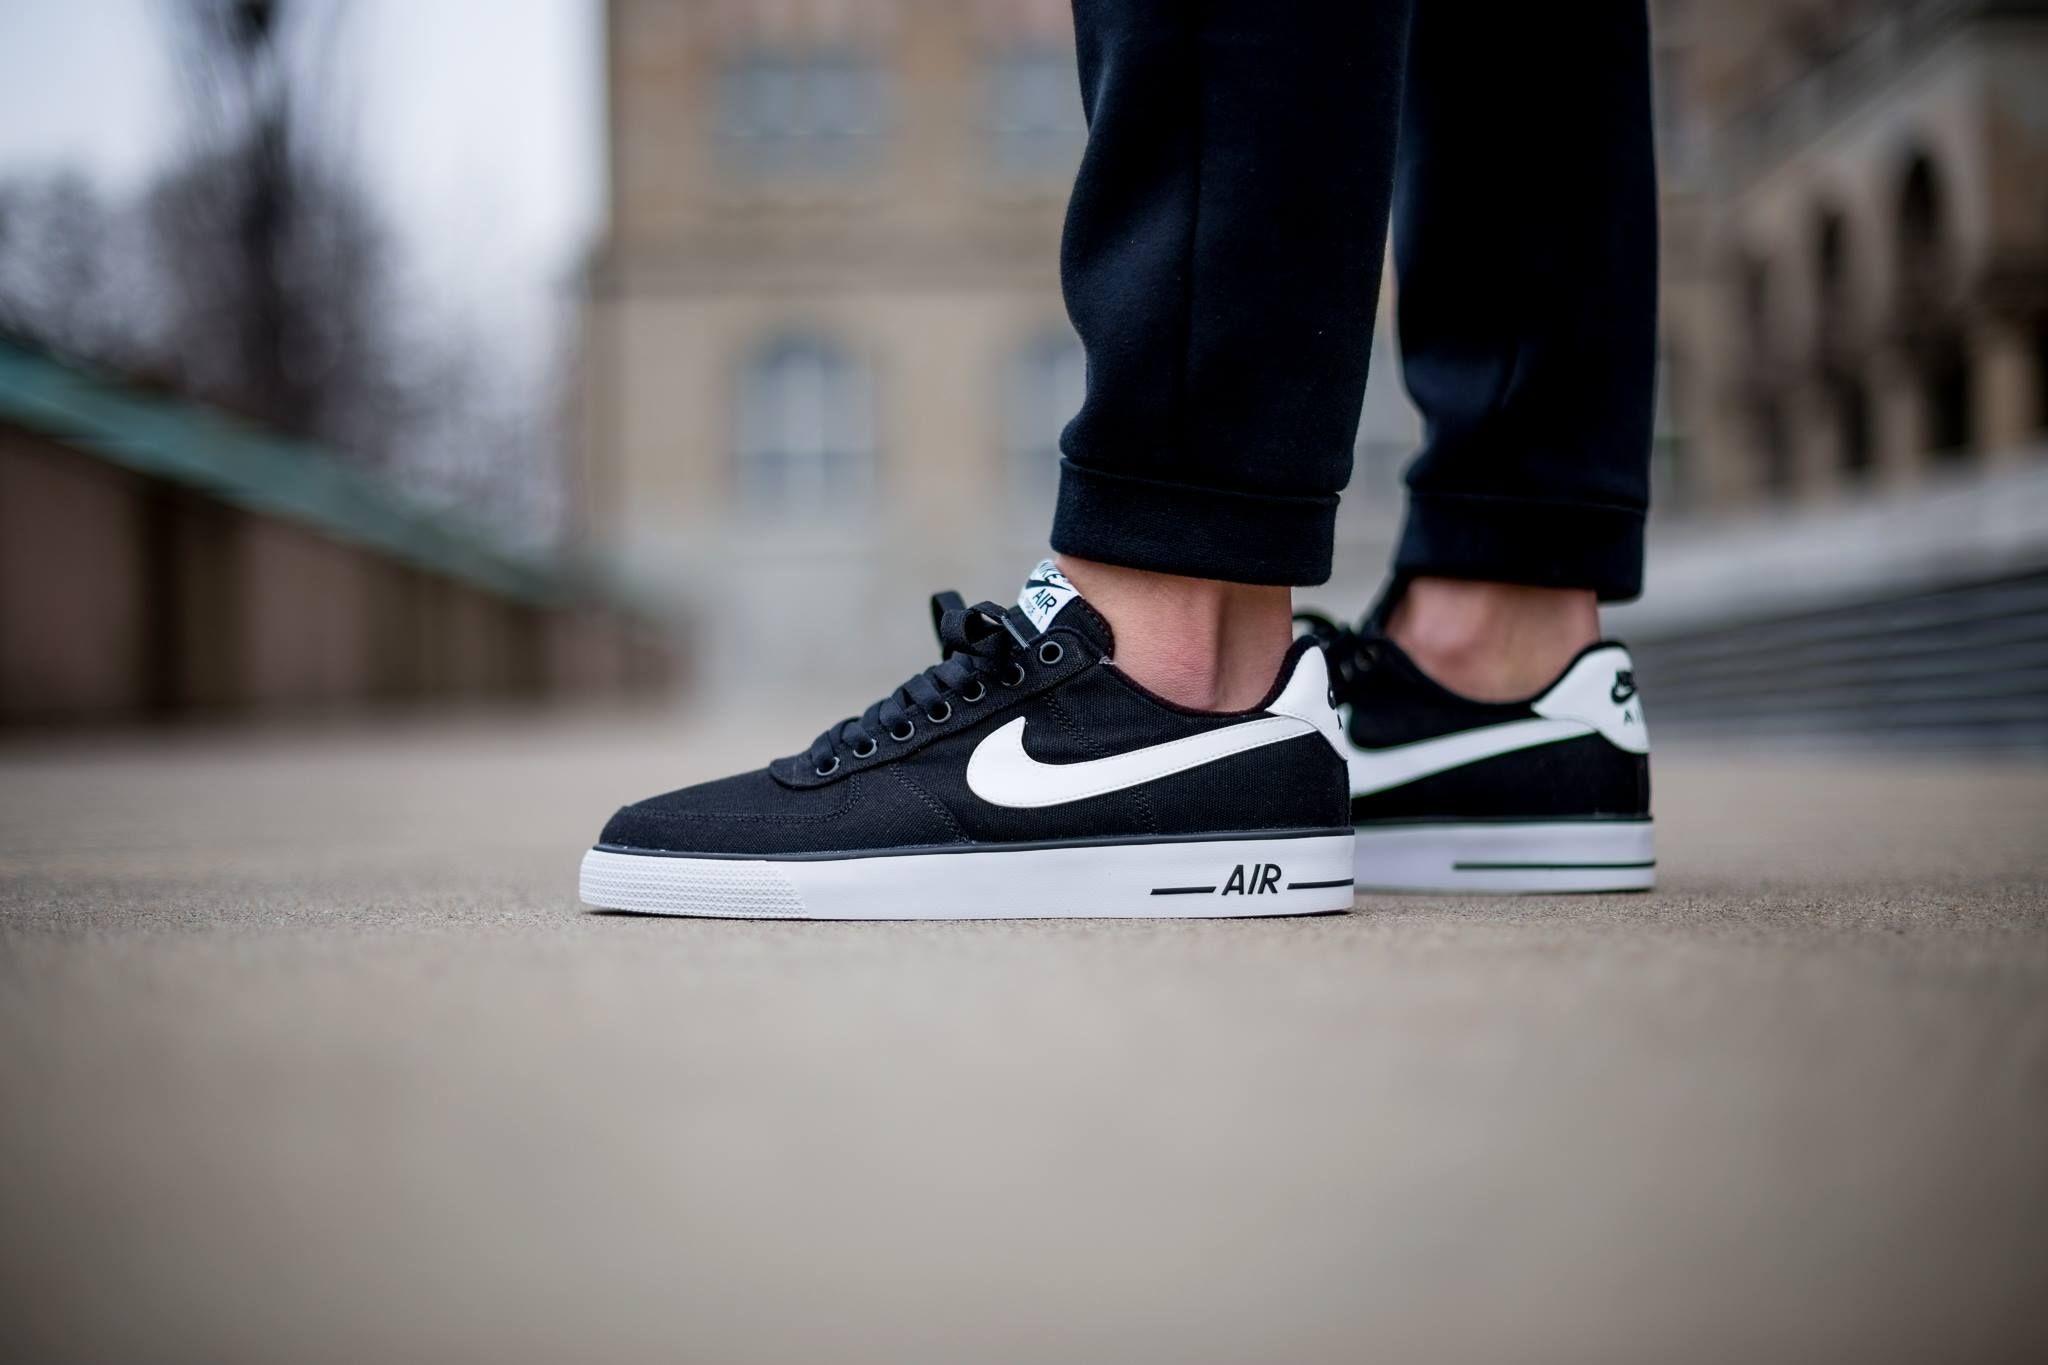 Nike Air Force 1 AC Sneaker, butikker, online shop  Sneaker, Shops, Online shop